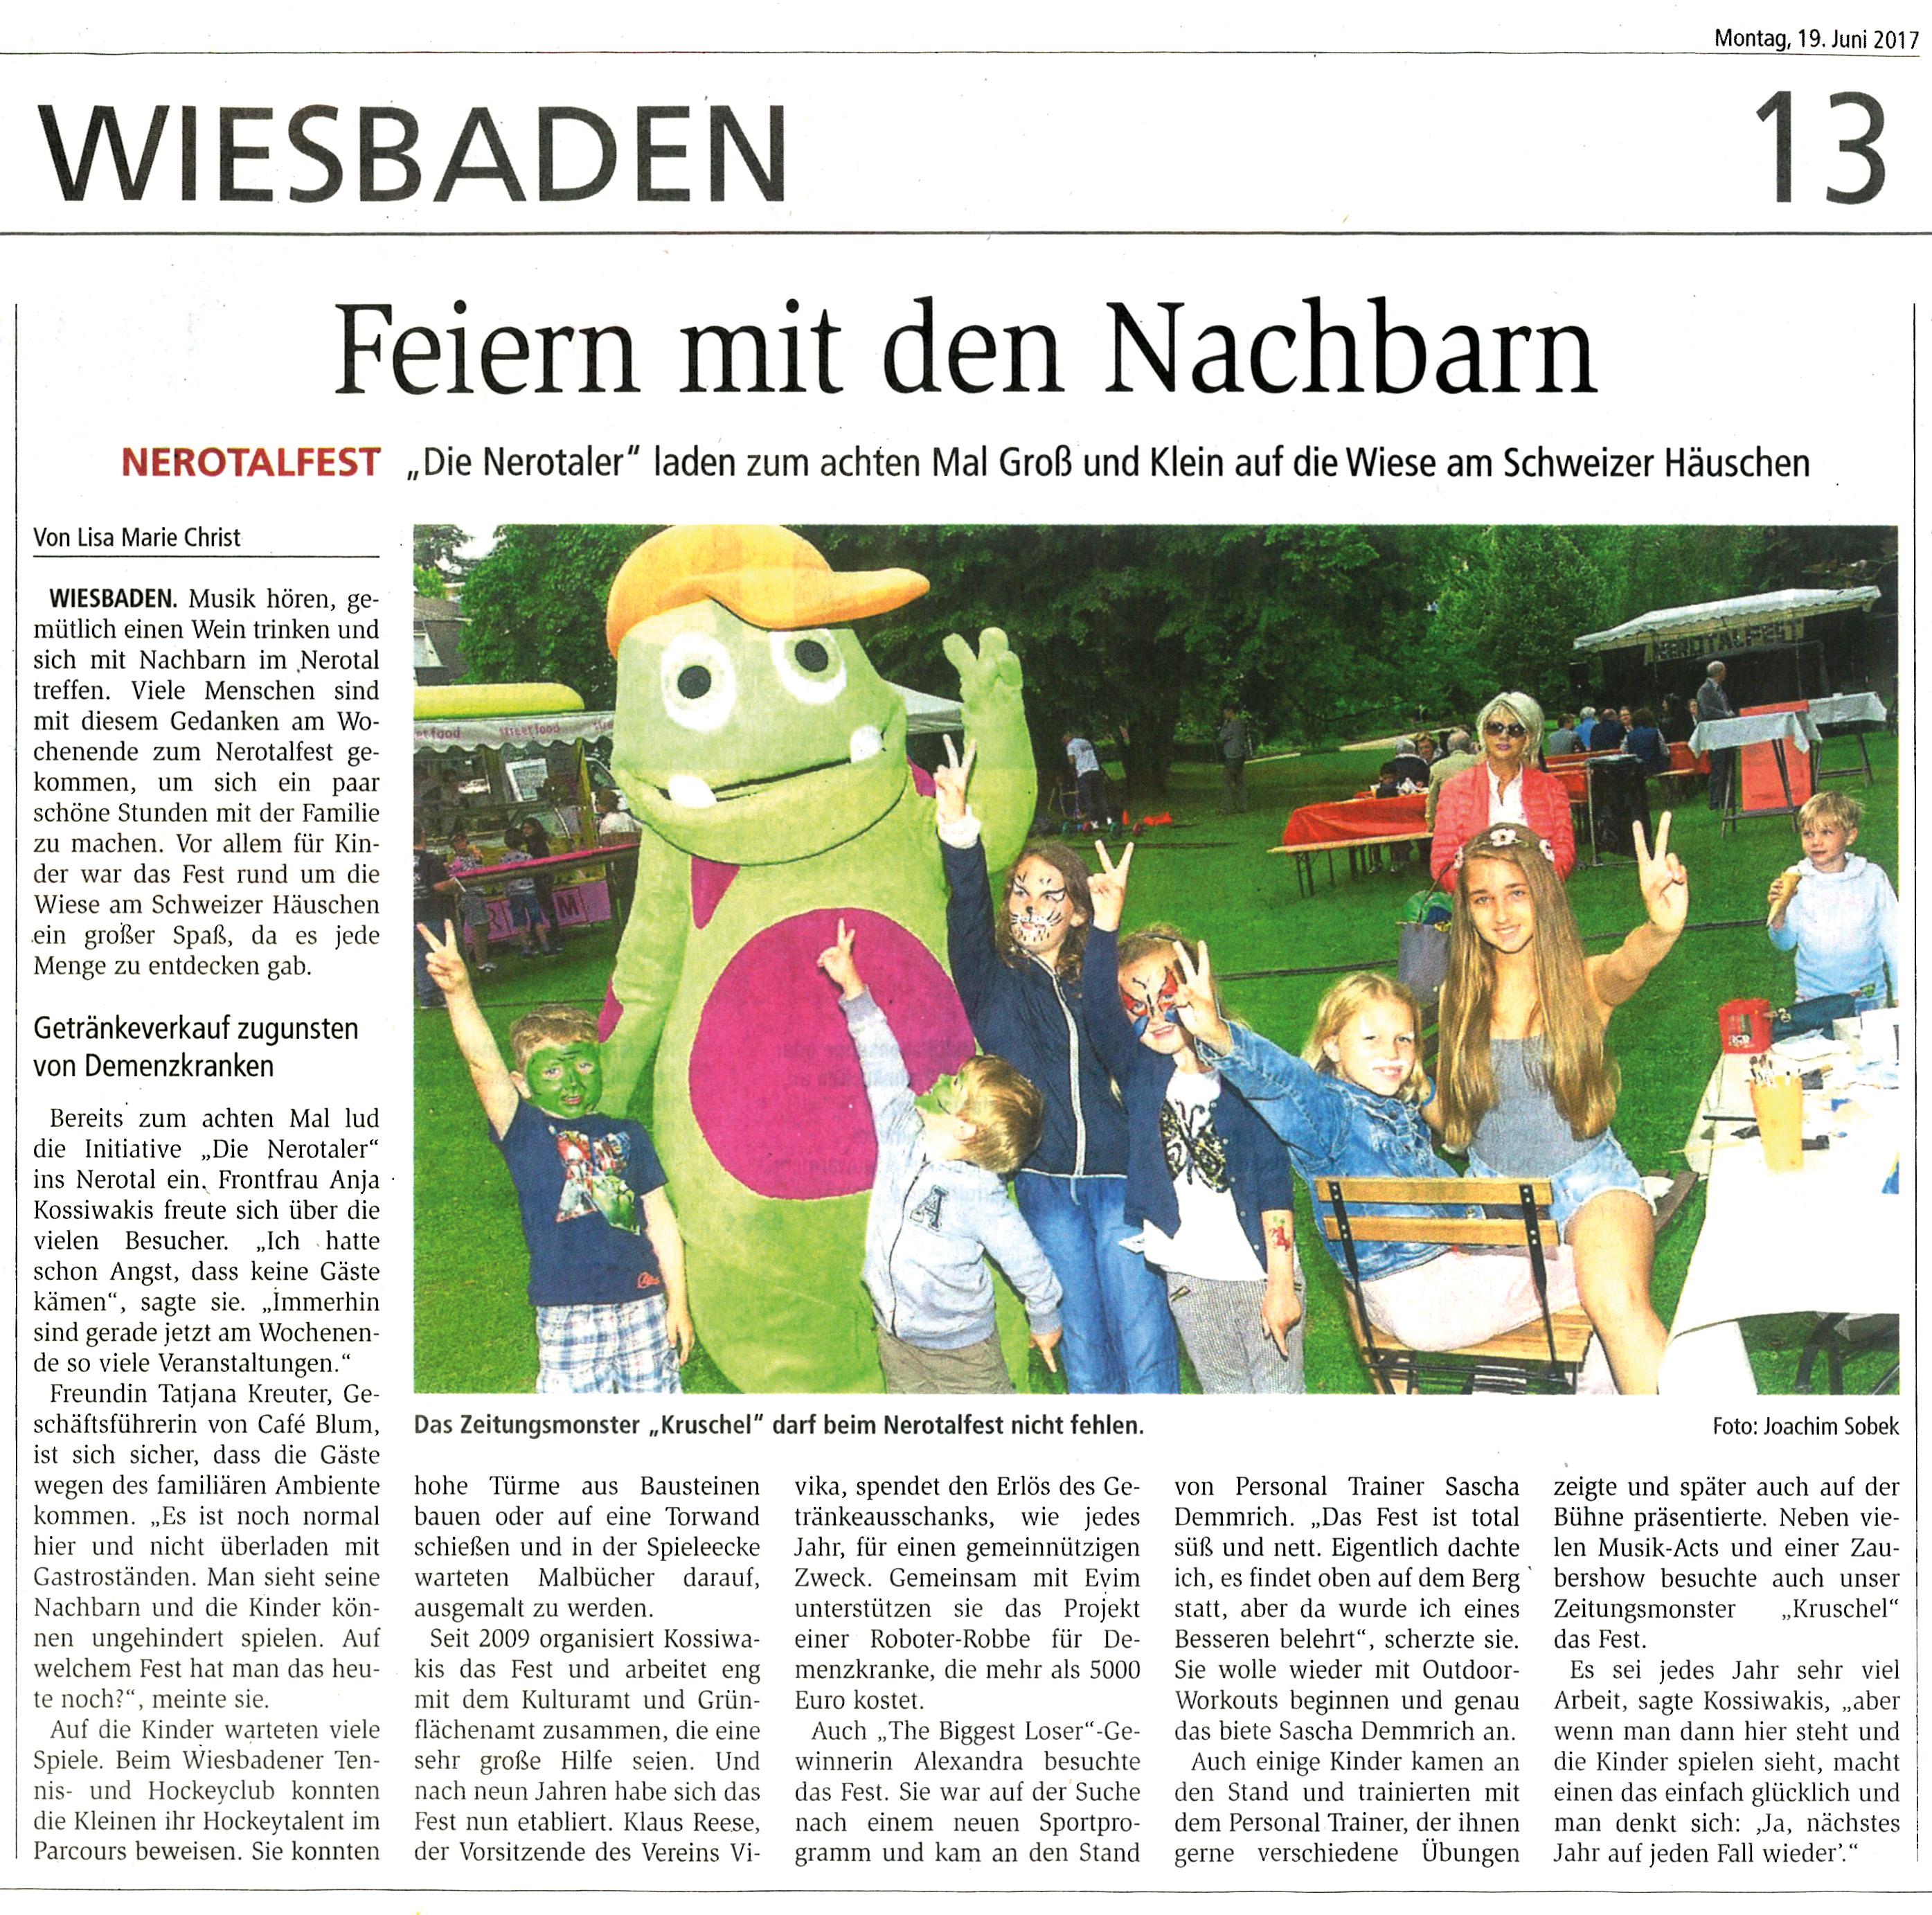 Nerotalfest WK Bericht 19.6.2017